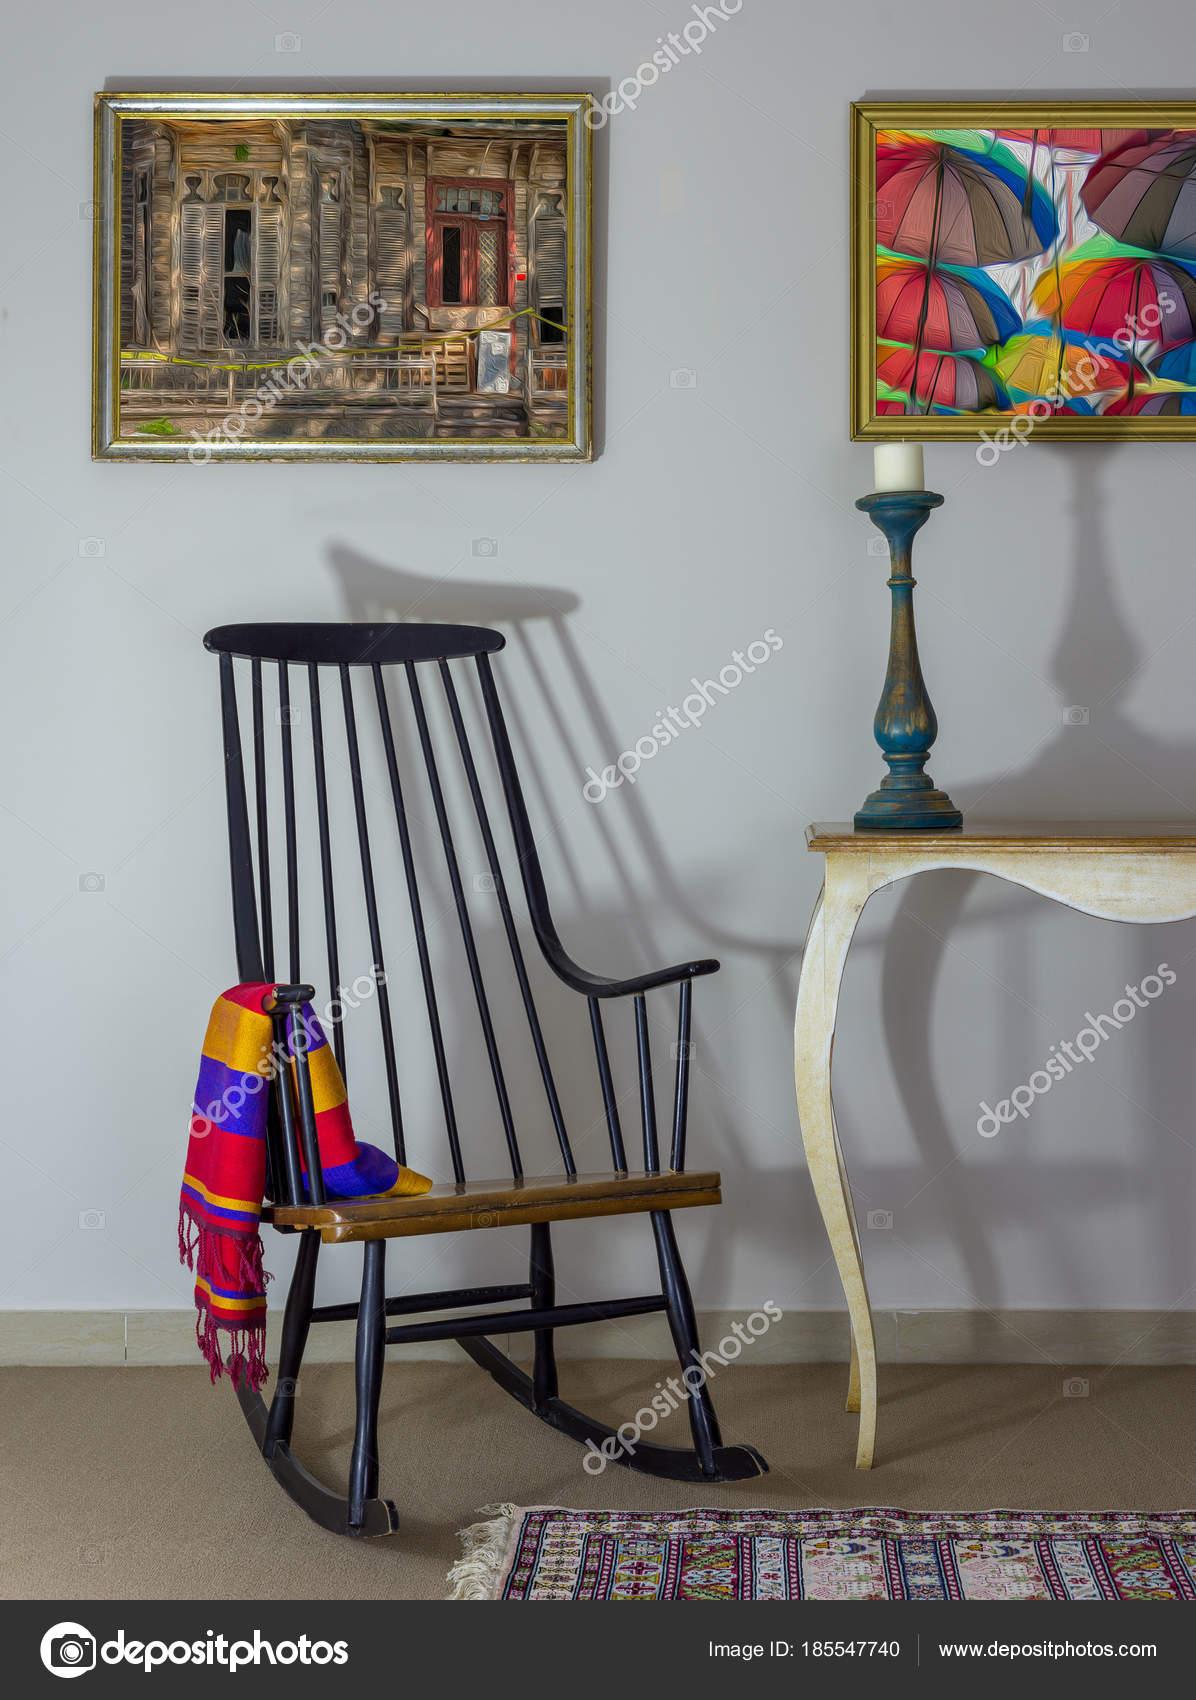 vintage gunga stol, gammal stil bord, ljusstake på bakgrund av off